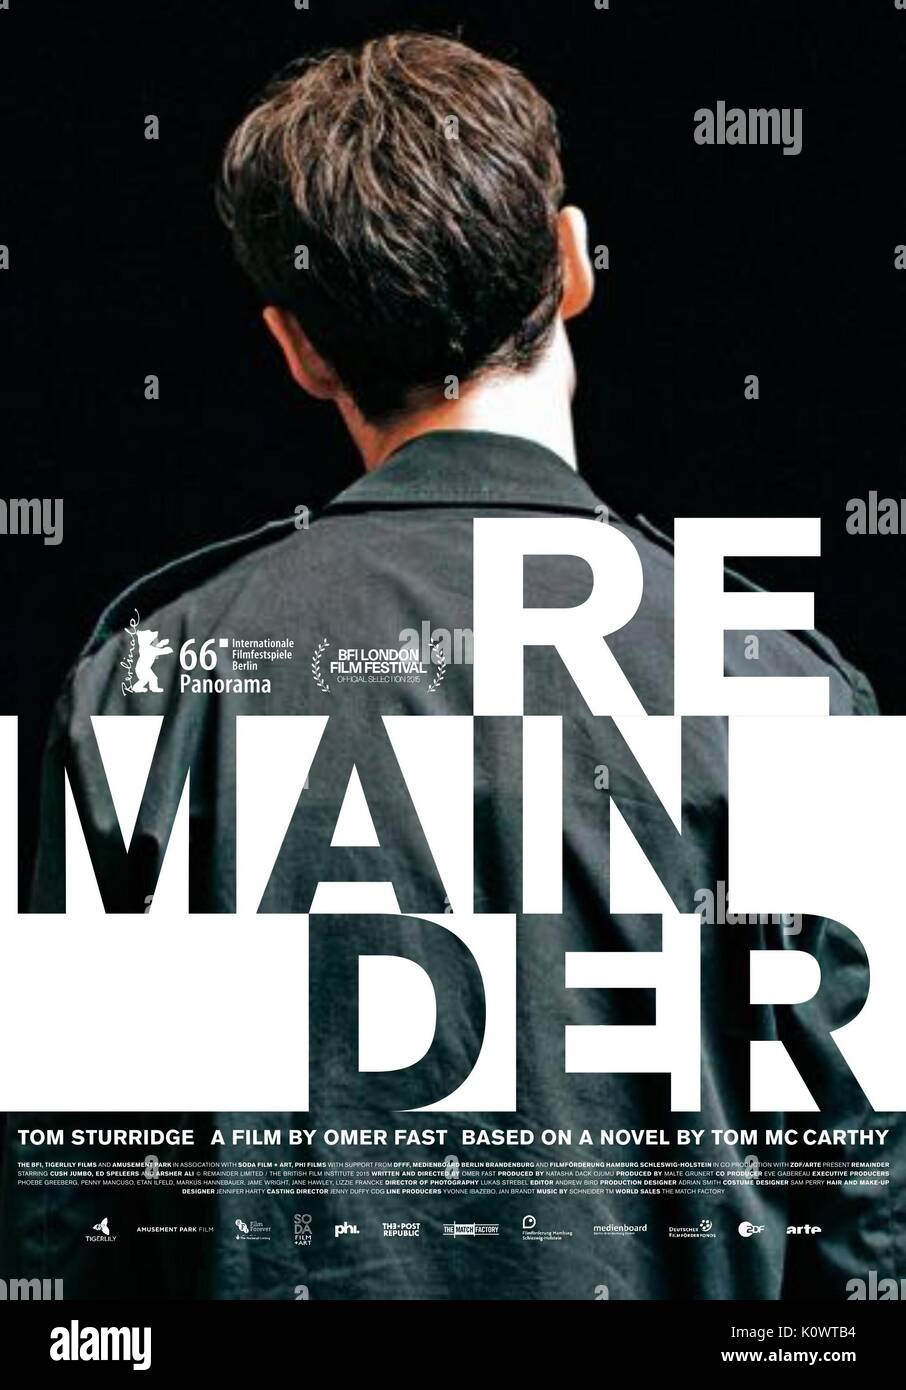 MOVIE POSTER REMAINDER (2015) - Stock Image